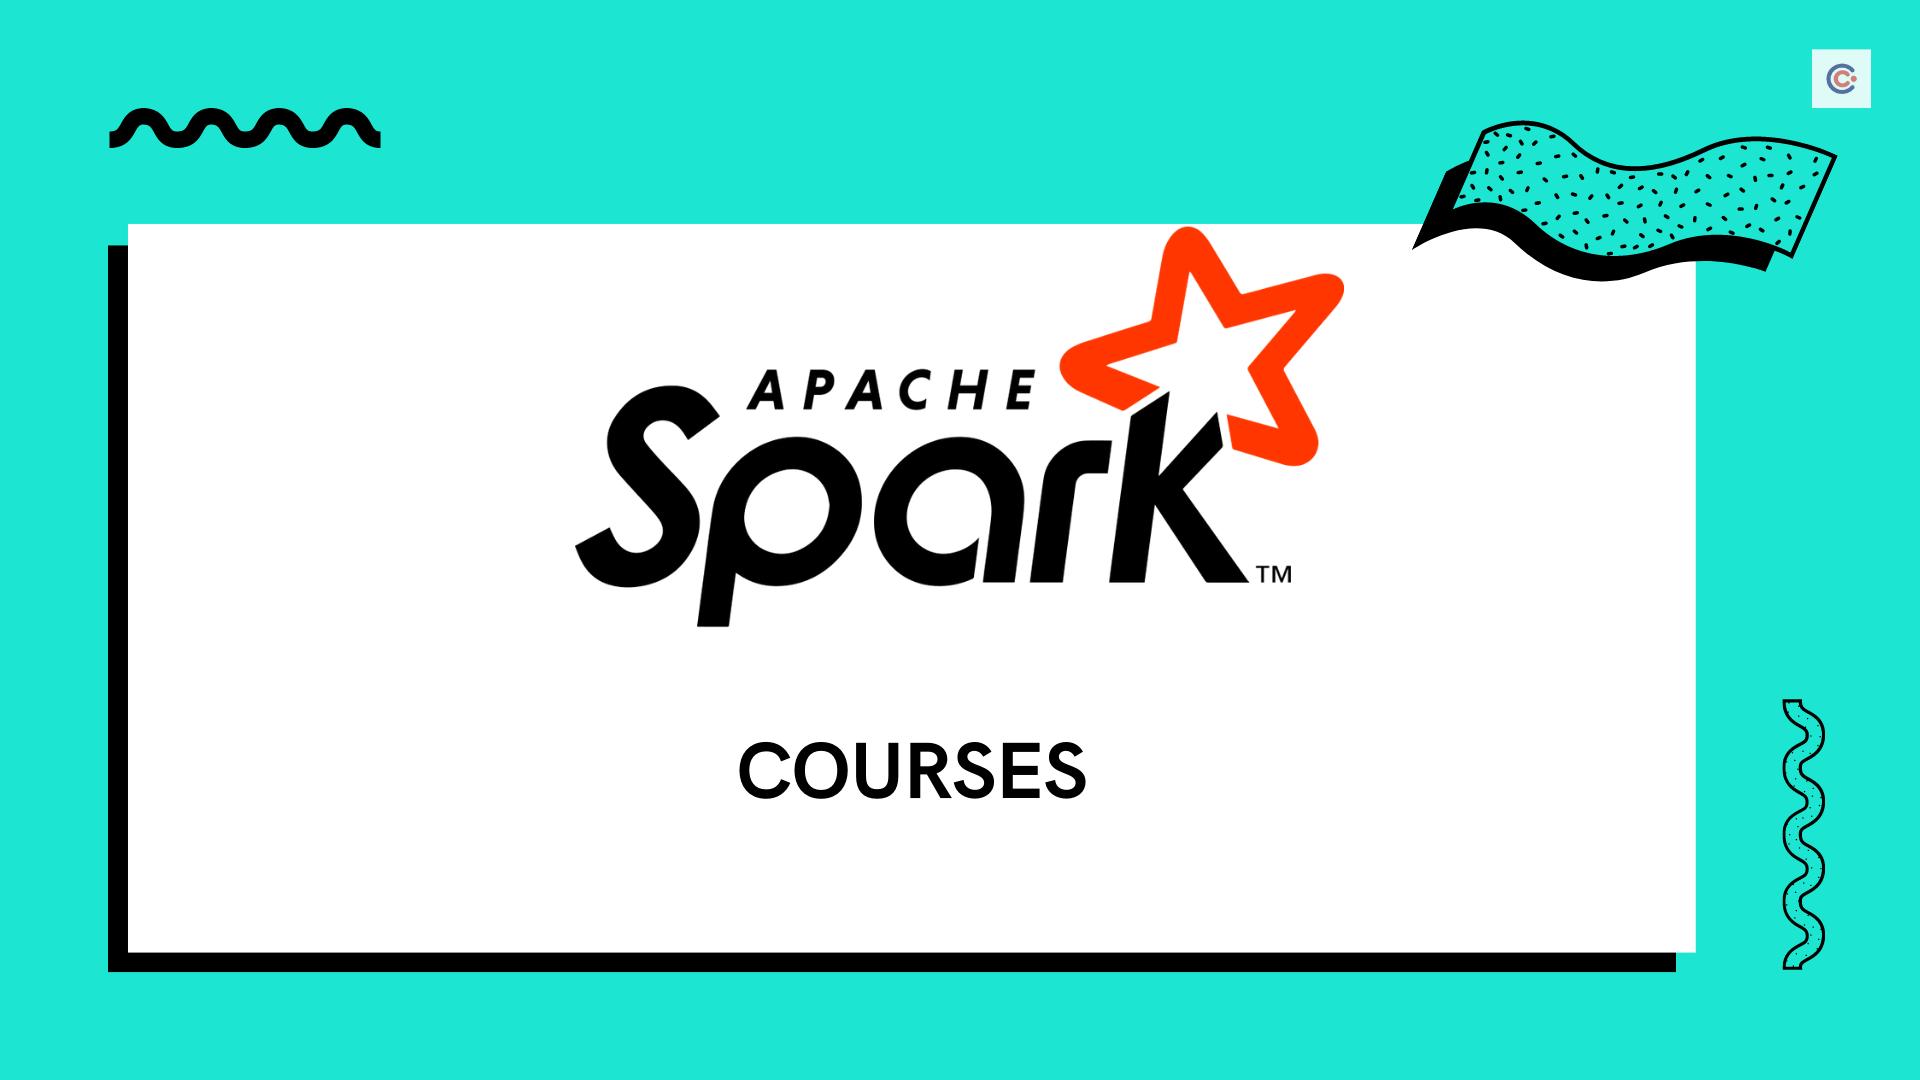 8 Best Apache Spark Courses - Learn Apache Spark Online